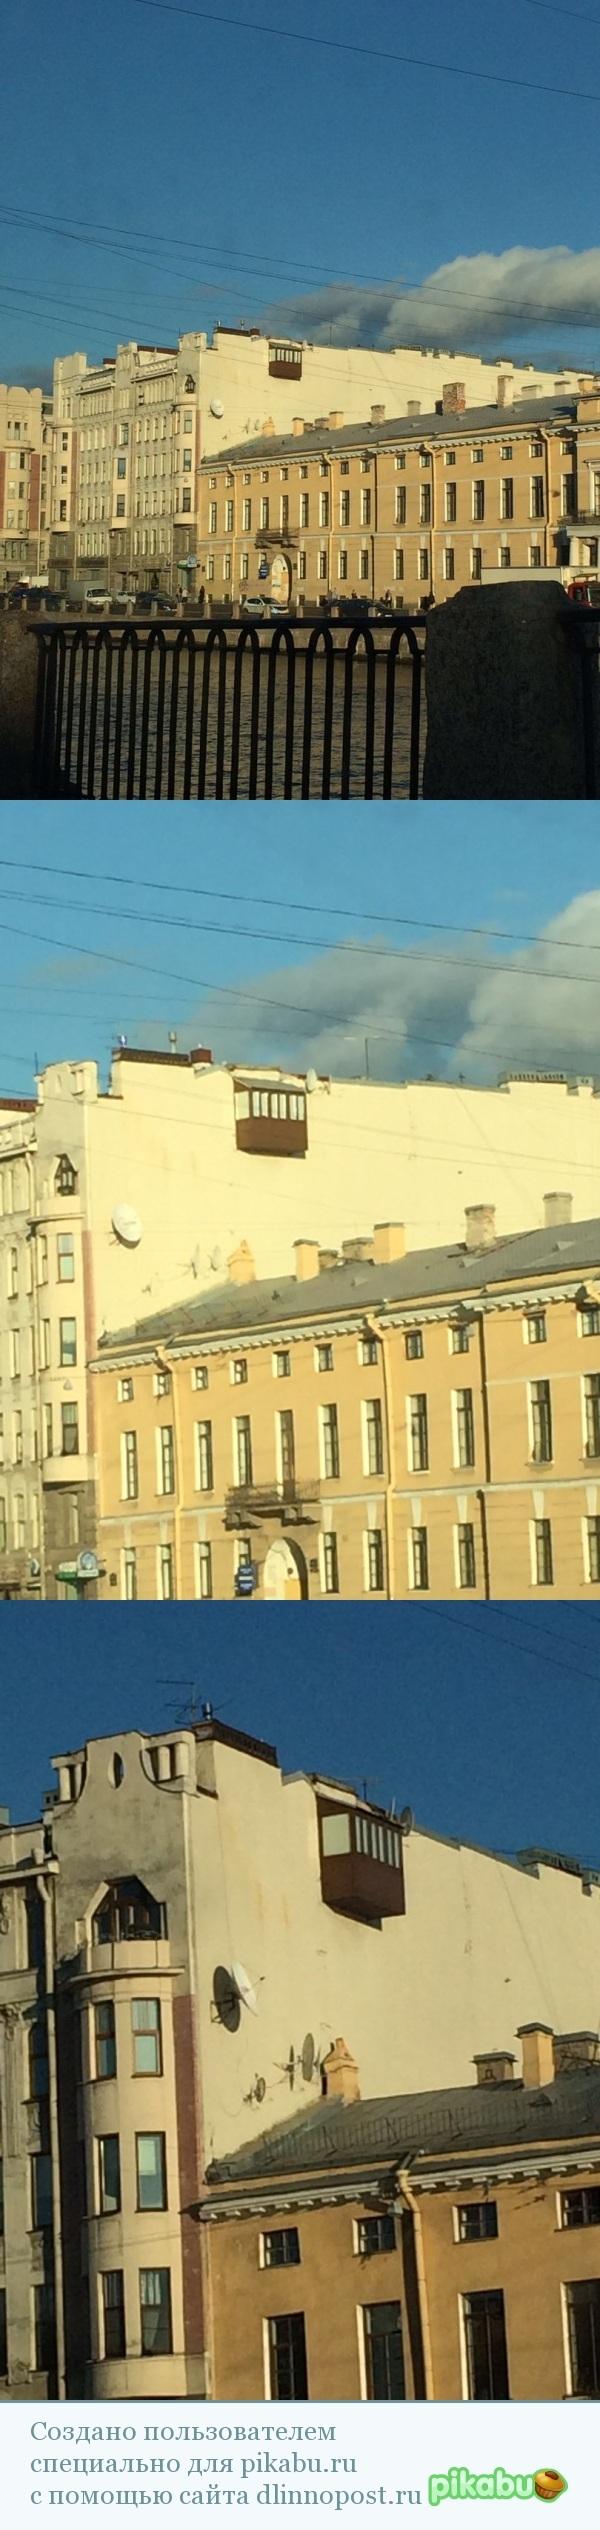 Балкон в Санкт-Петербурге Санкт-Петербург, Фонтанка, Балкон, Iphone 6, Текст, Длиннопост